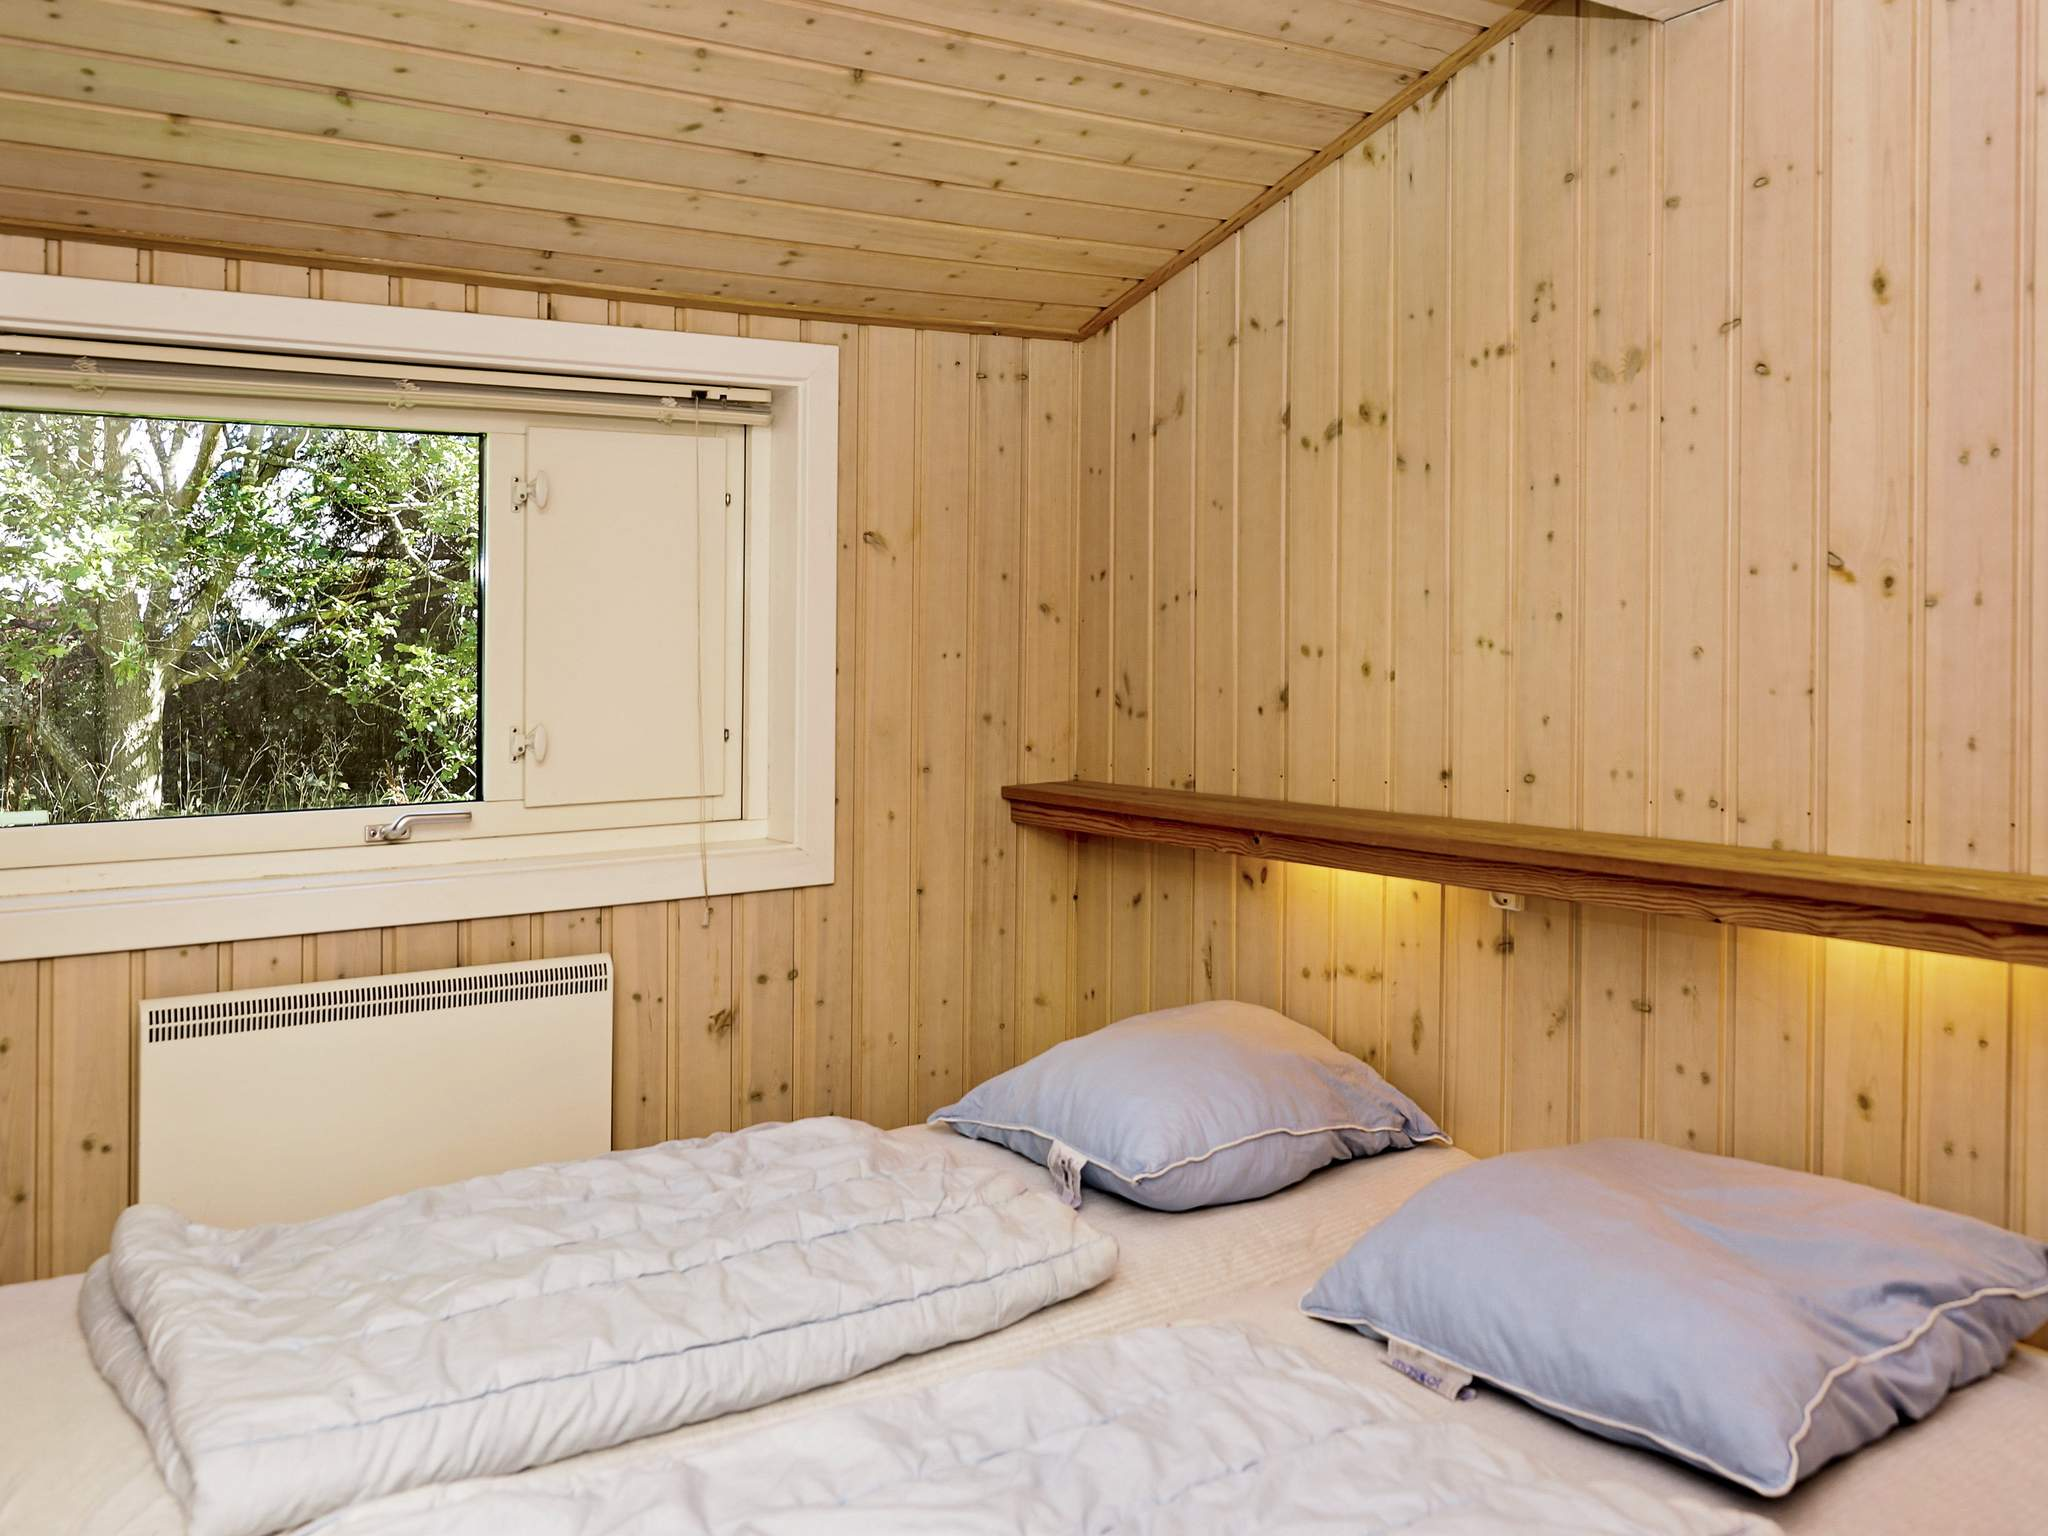 Maison de vacances Østre Sømarken (82470), Aakirkeby, , Bornholm, Danemark, image 6